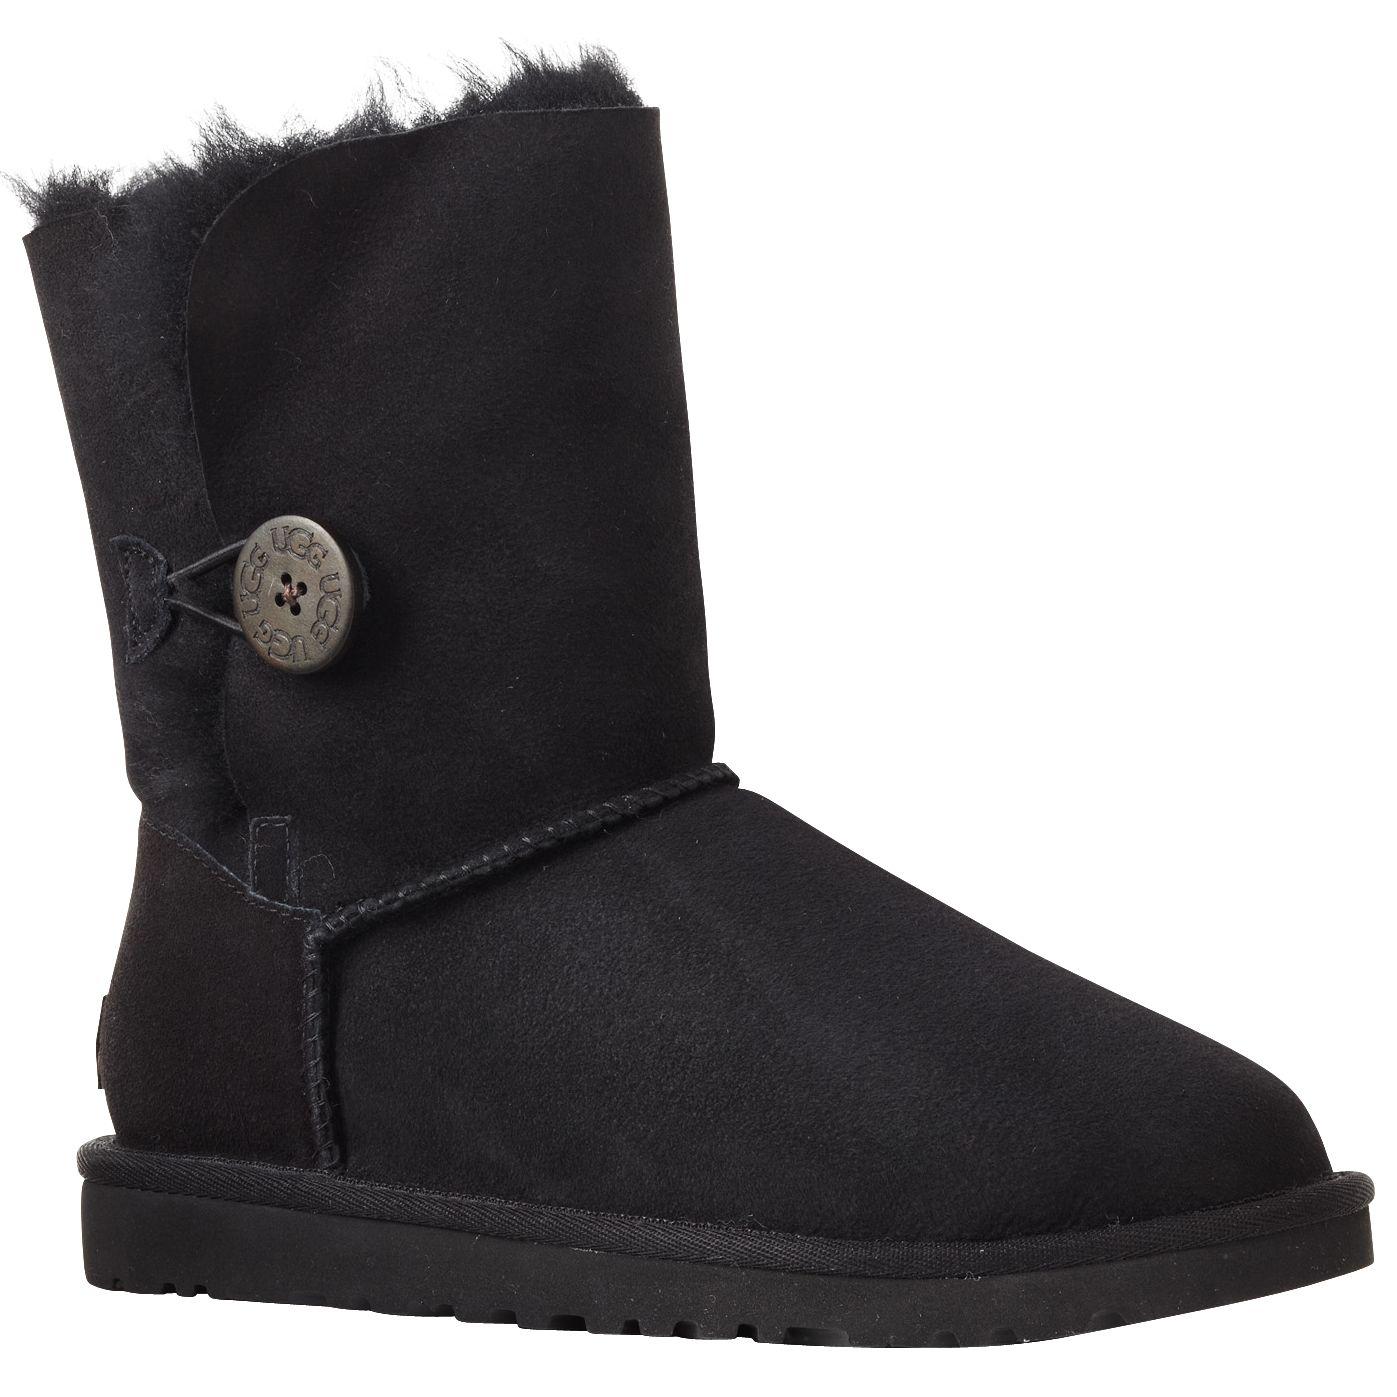 UGG B Button Short Boots, Black at John Lewis